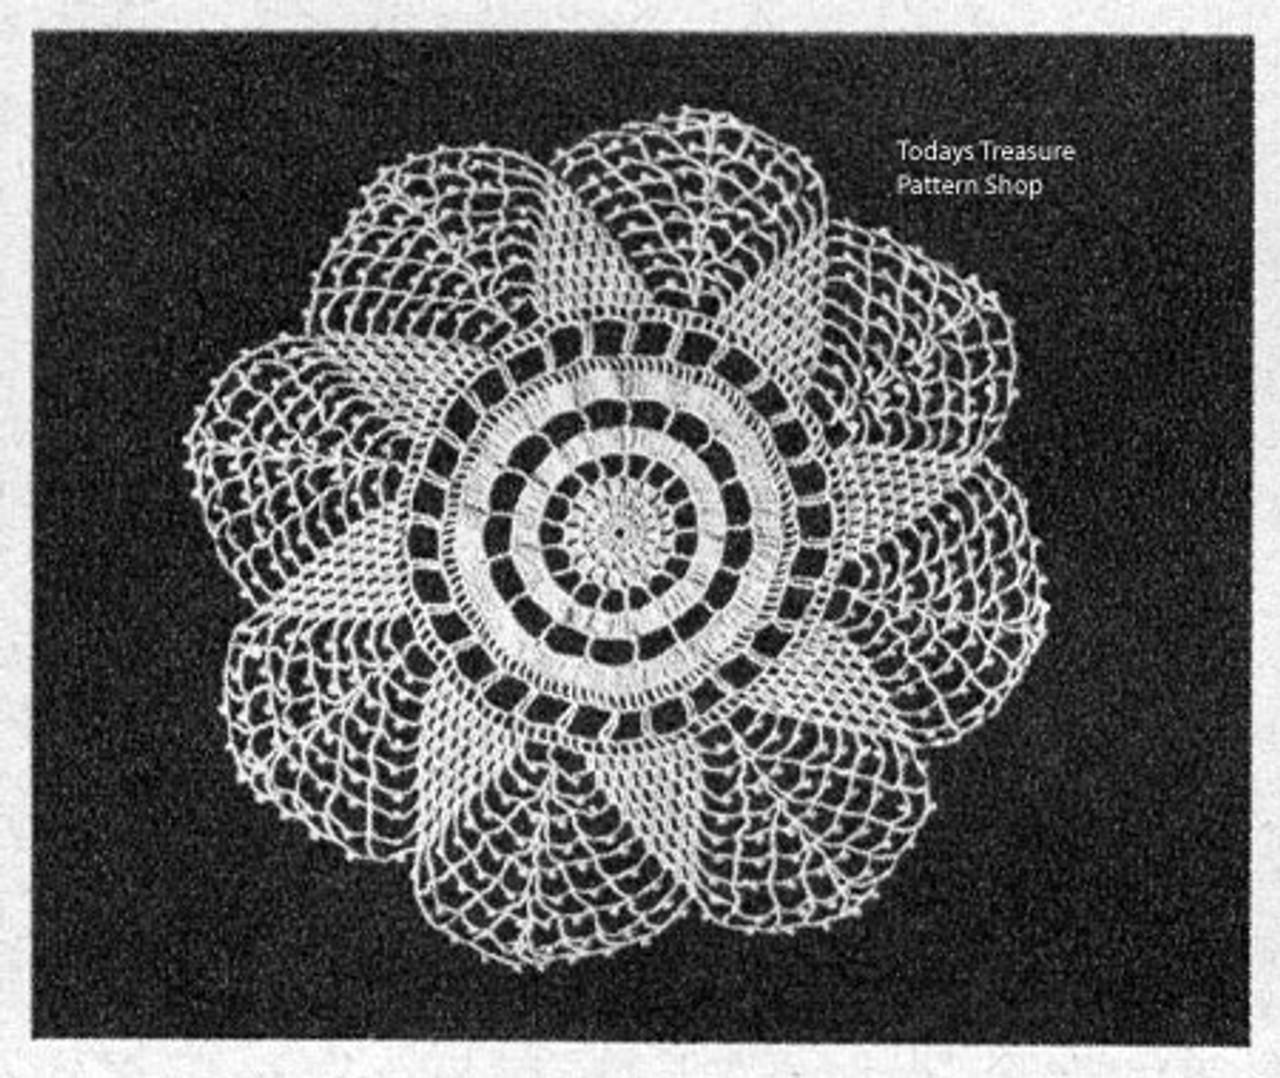 Vintage Crochet Star Doily Pattern in Pineapples